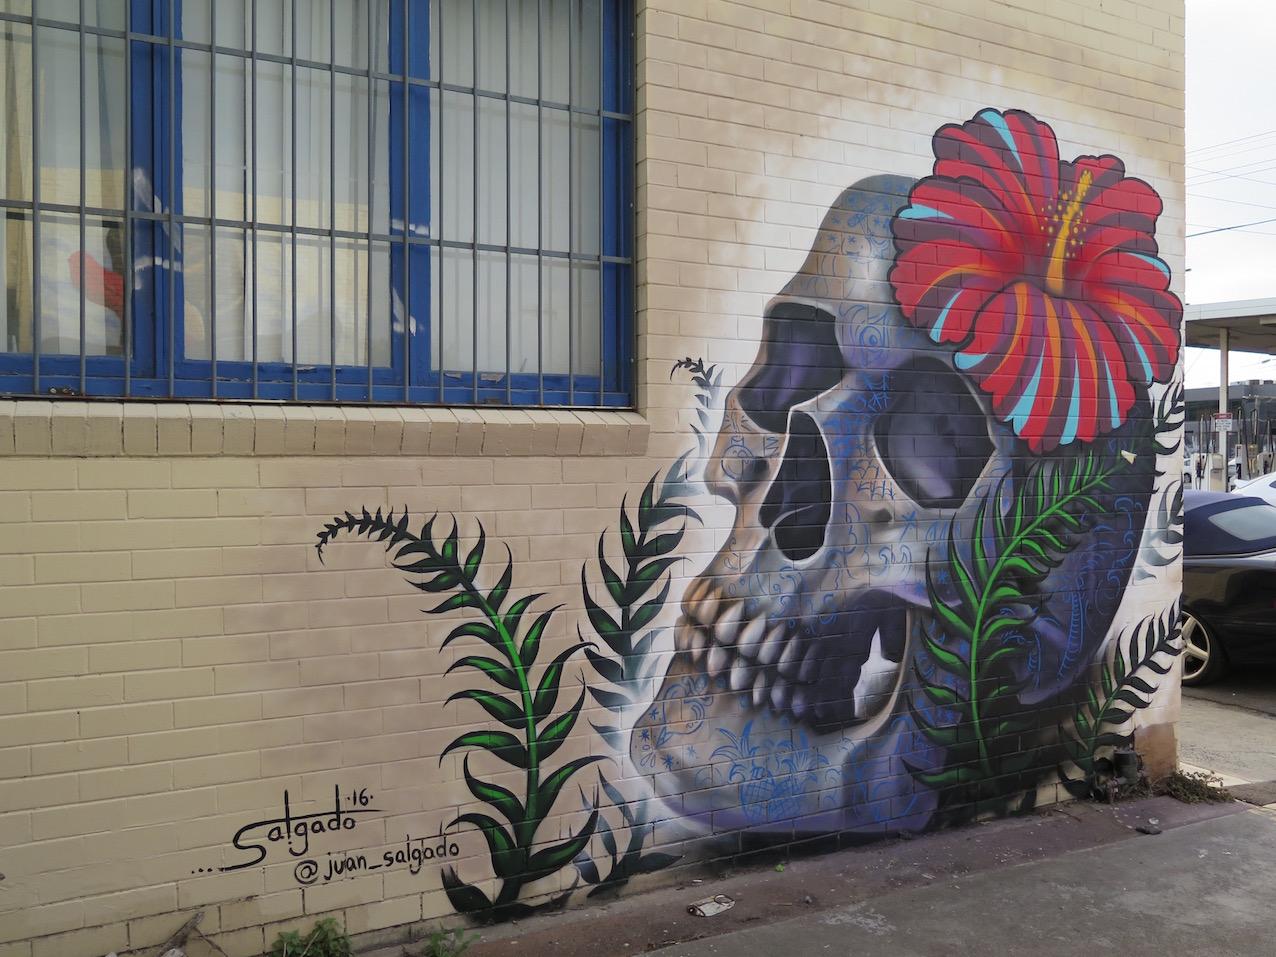 deansunshine_landofsunshine_melbourne_streetart_graffiti_invurt top ten 59 3 Juan Salgado 3